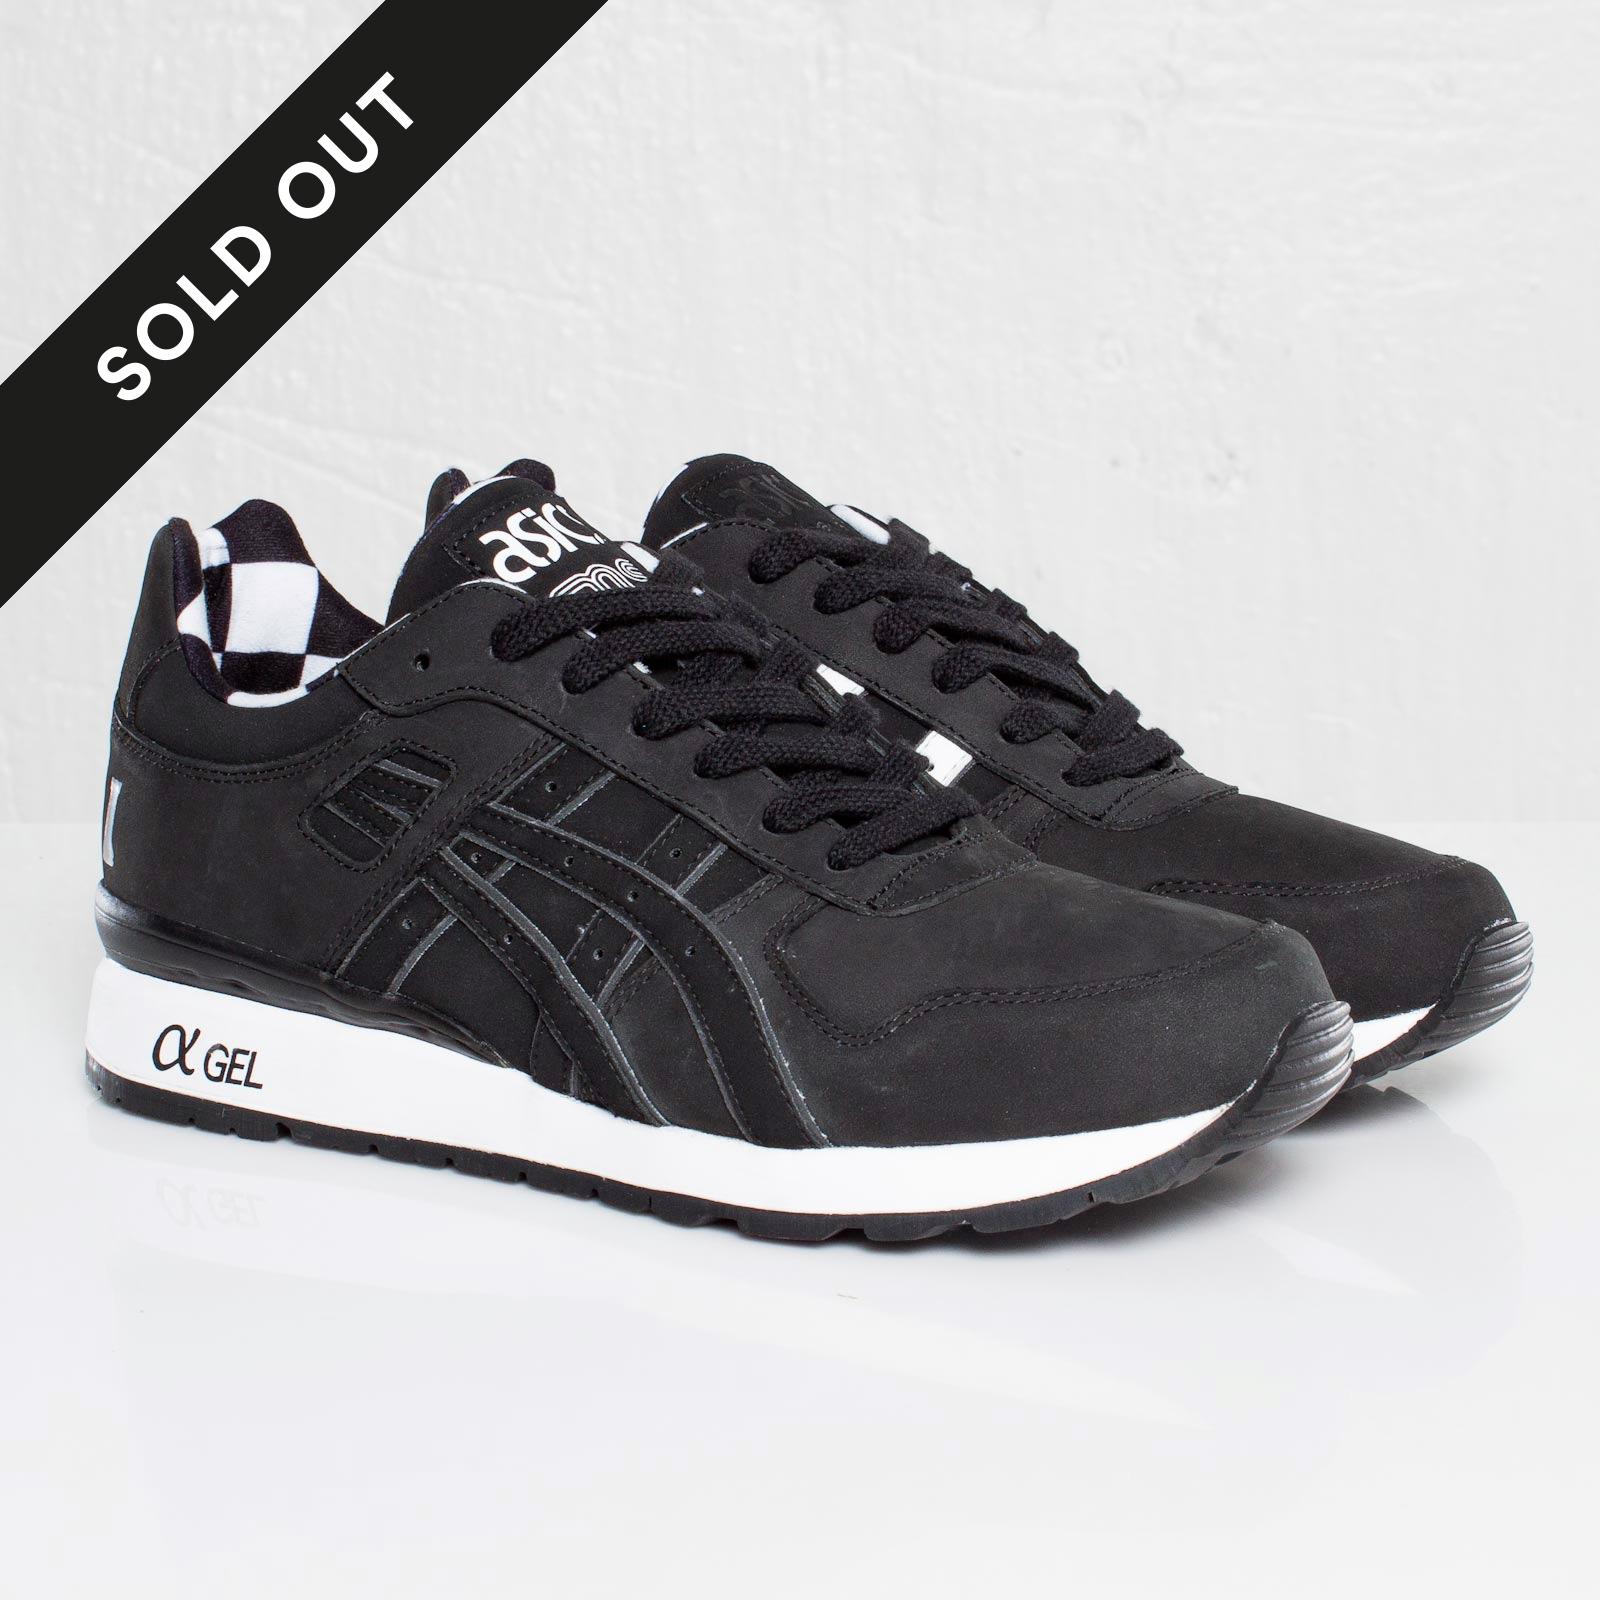 innovative design 181f9 c6380 ASICS Tiger GT-II - H20sk-9090 - Sneakersnstuff I Sneakers ...